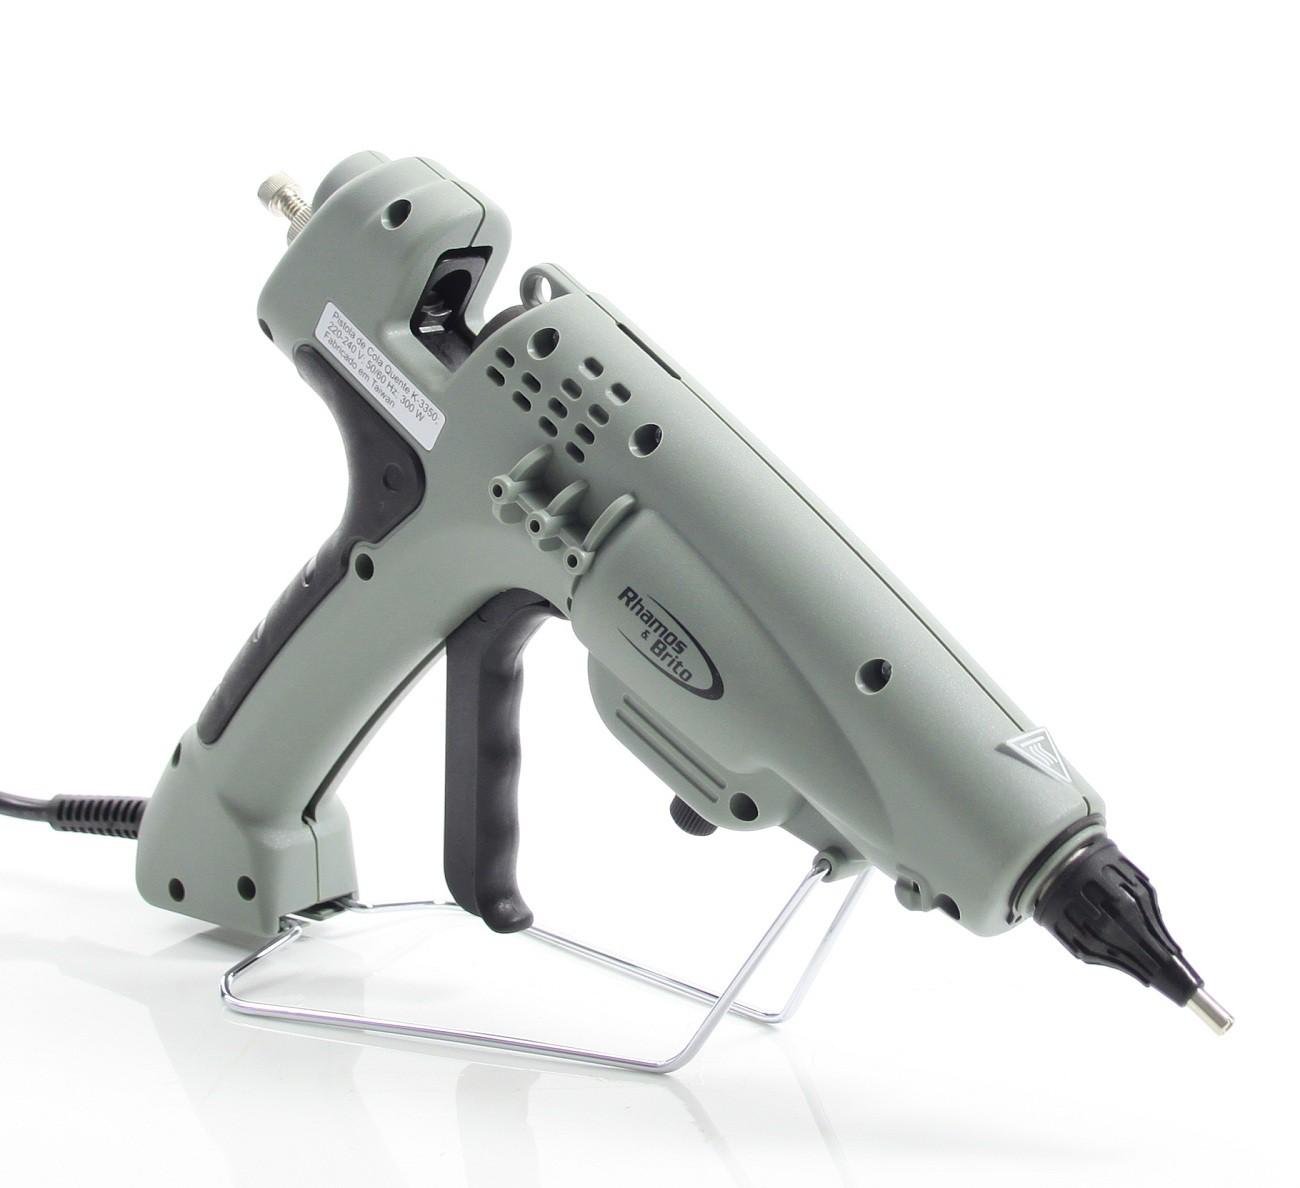 Pistola de Cola Quente (grossa) K-3350